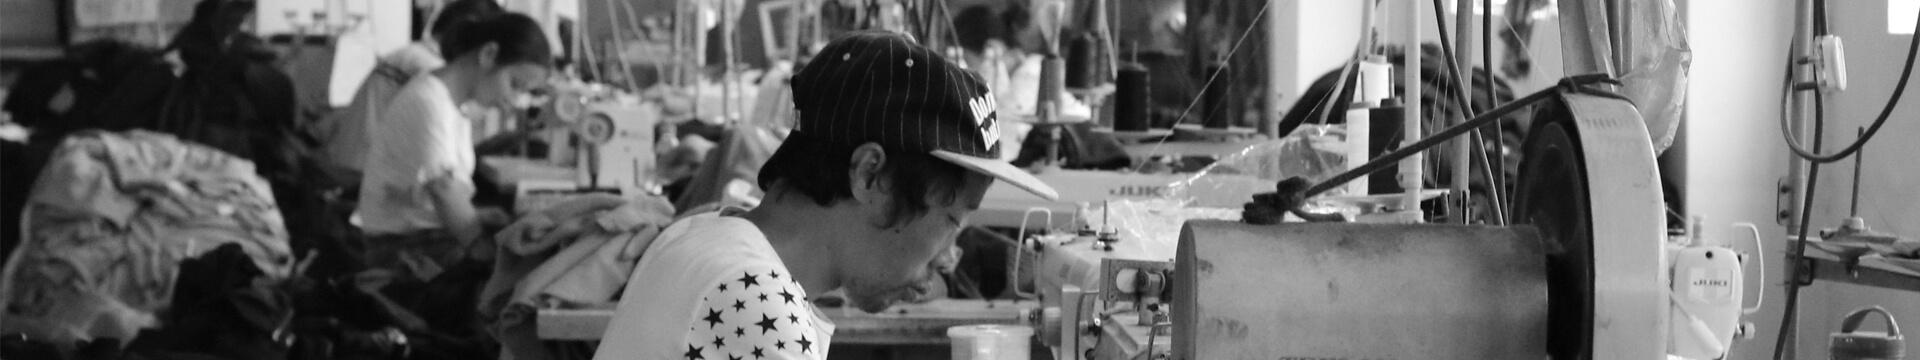 Garment Factory History